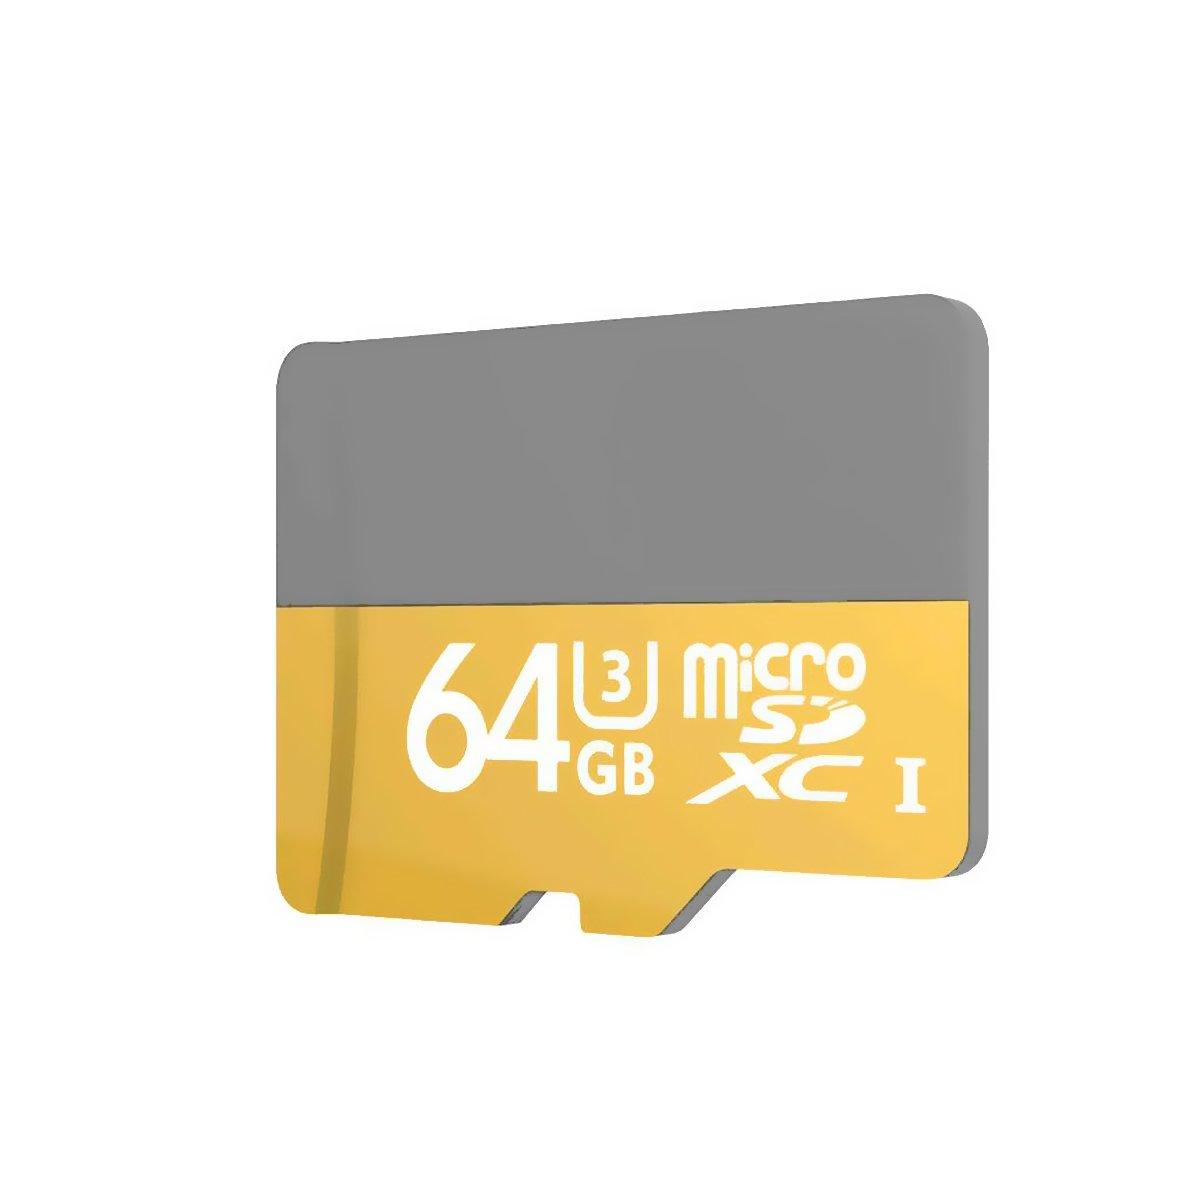 64GB 100MB/s (U3) MicroSD EVO Select Memory Card with Adapter (003)